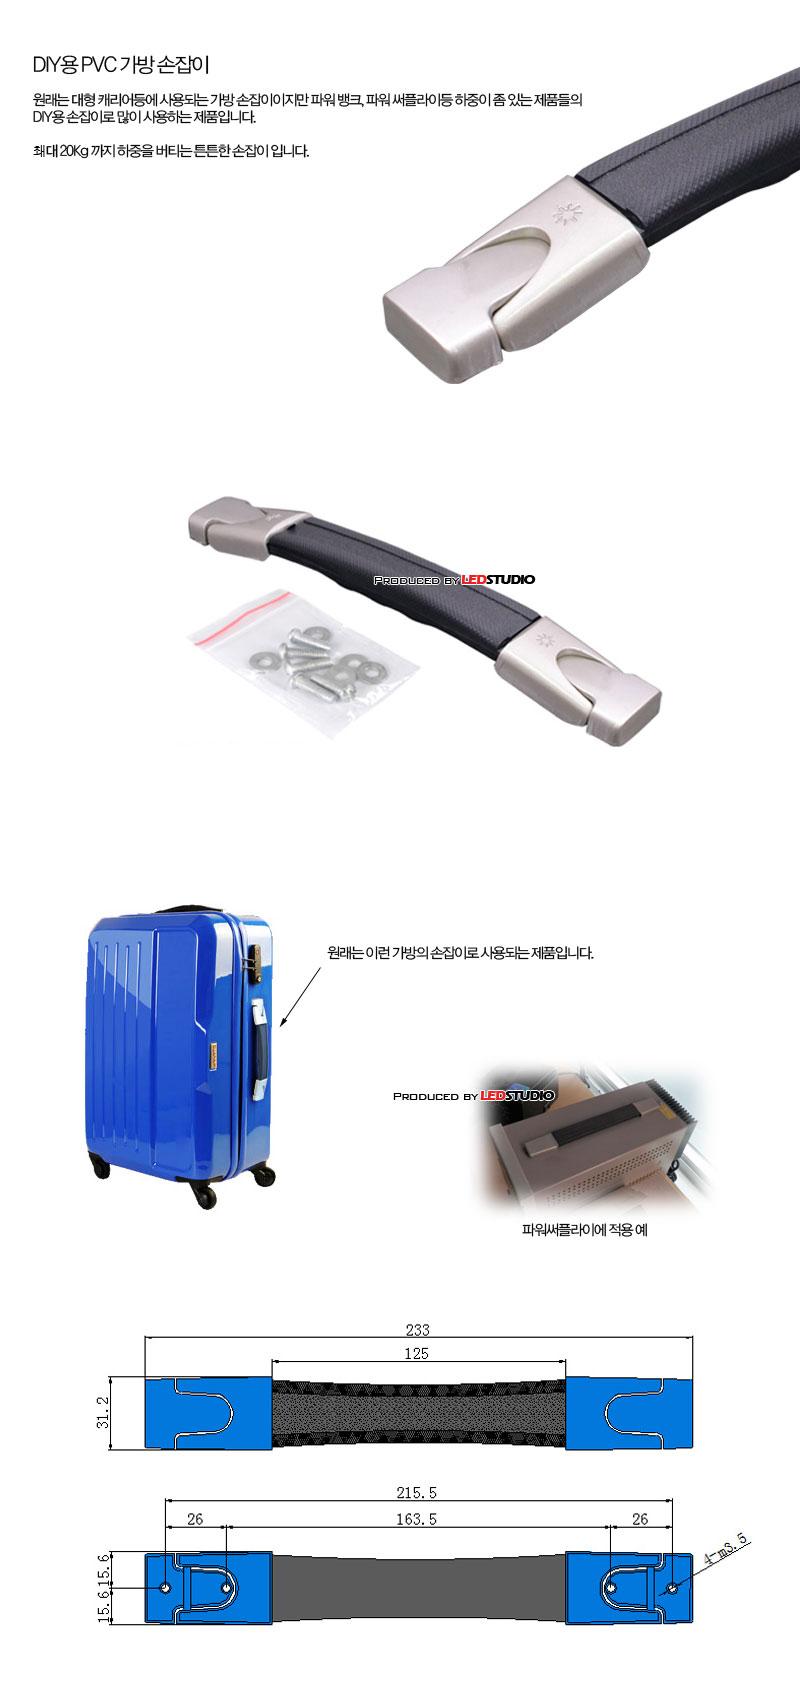 DIY용 PVC 가방 손잡이 (고 하중용 손잡이)